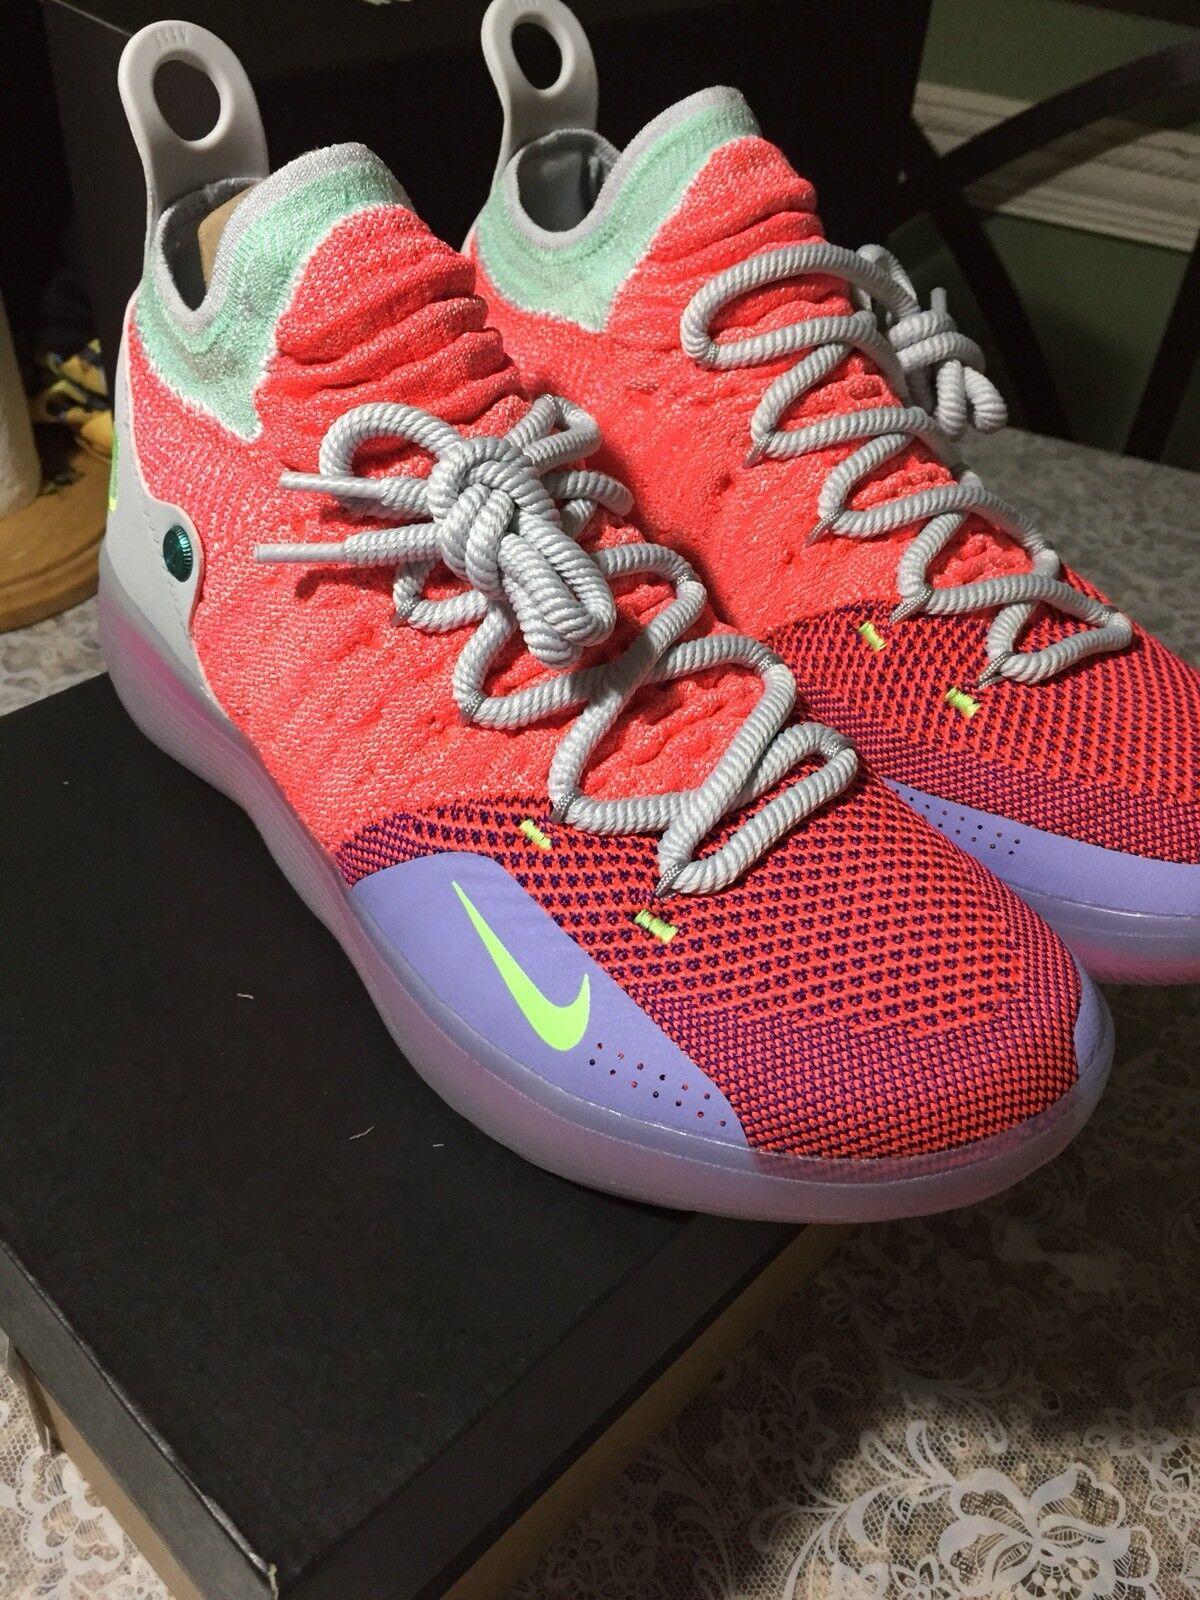 Nike kd 11 eybl peach jam us9 molto limitata mvp kevin durant x - ix - viii